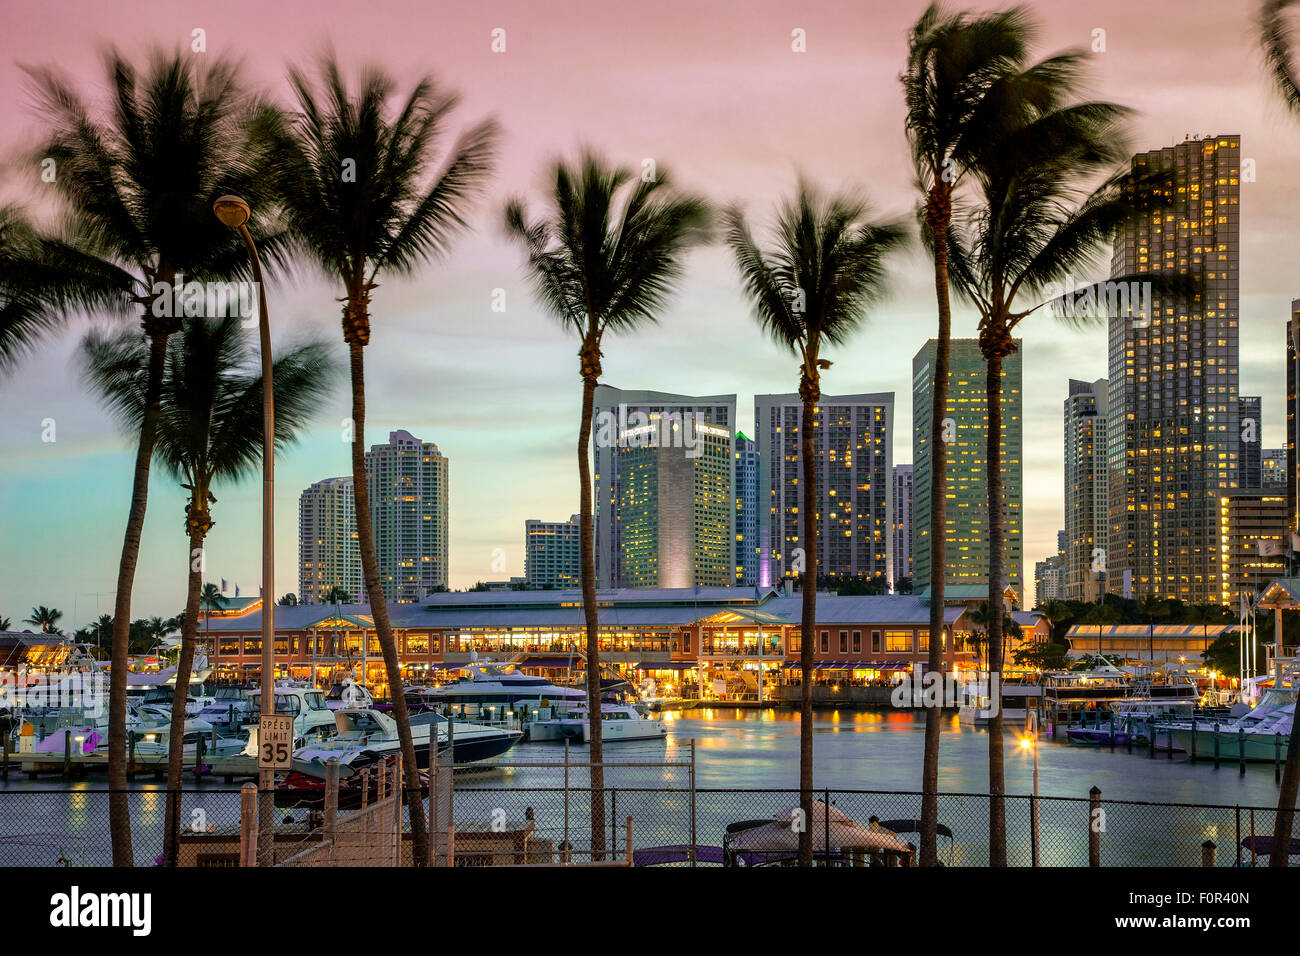 Miami, Bayside Mall al atardecer Imagen De Stock